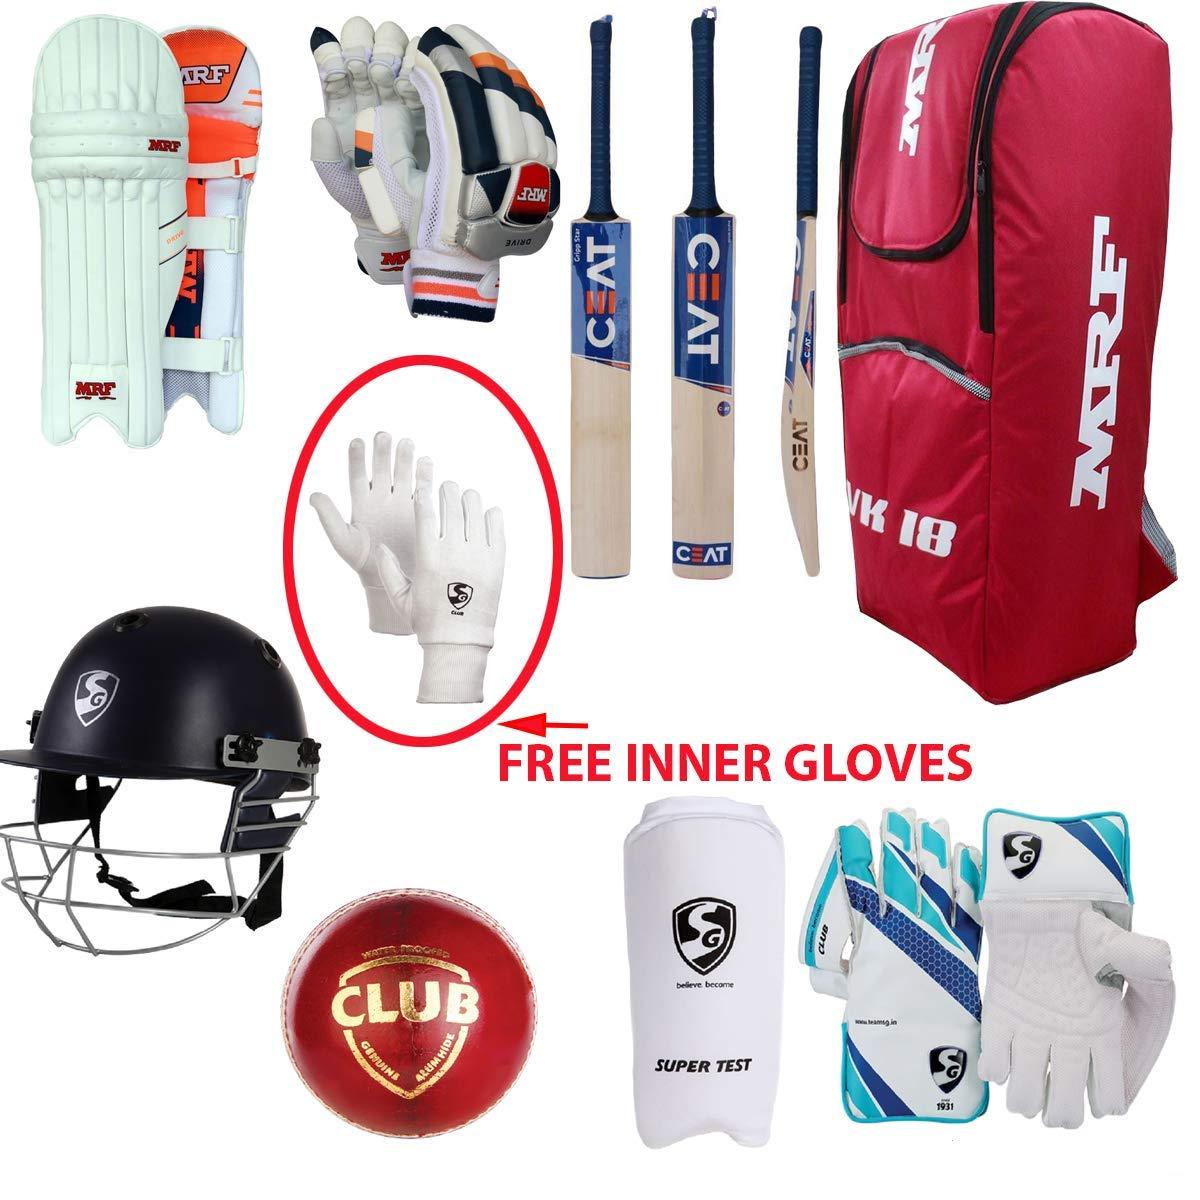 Senior League 20-20 Cricket Kit Kashmir Willow Bat Set For 13+Yr Child Full Size